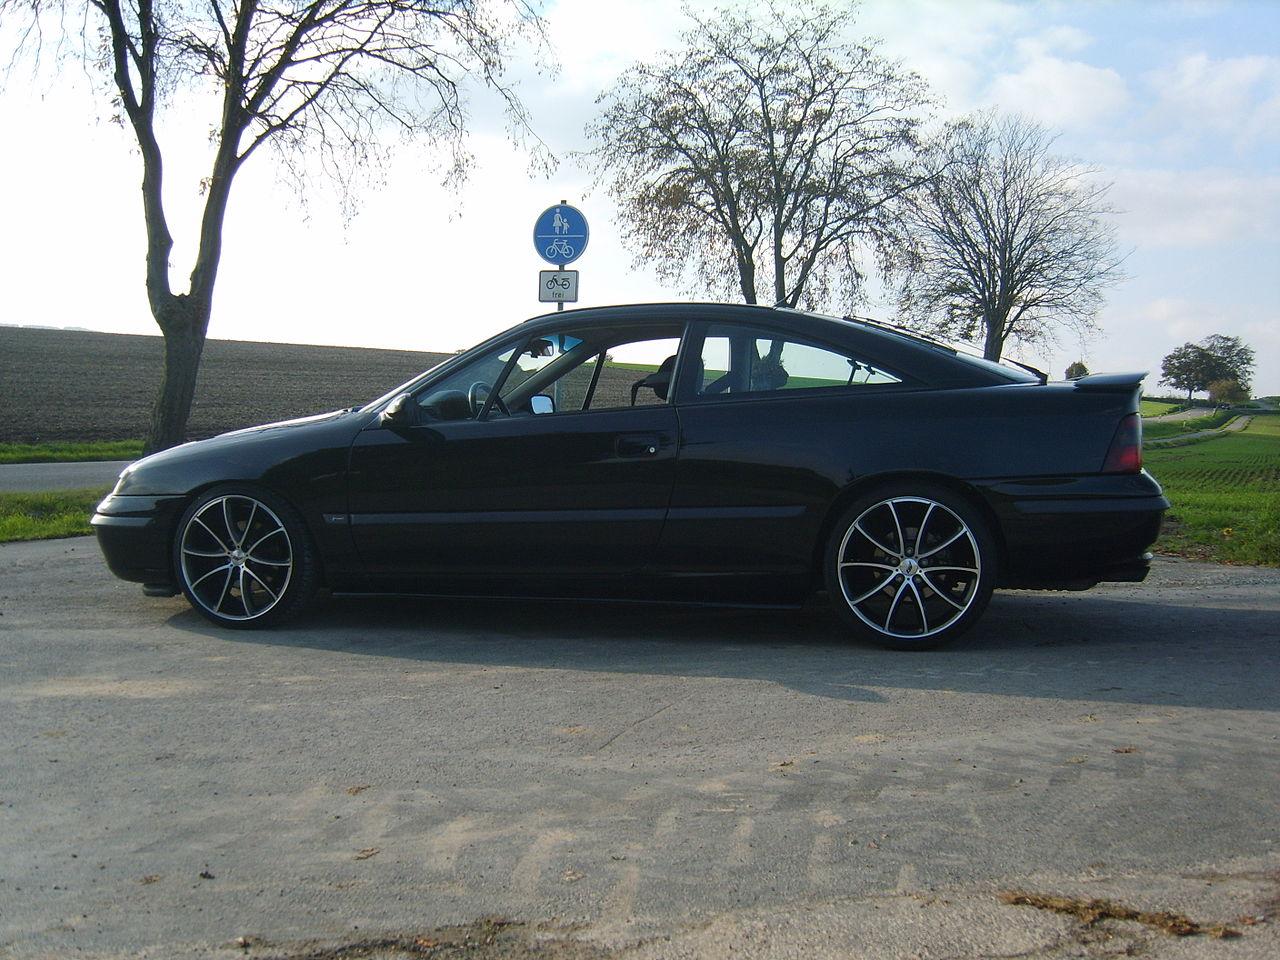 Opel Calibra, foto: Michael110476, volné dílo, dostupné z https://commons.wikimedia.org/wiki/Category:Opel_Calibra#/media/File:2007_1013_154230AA.JPG